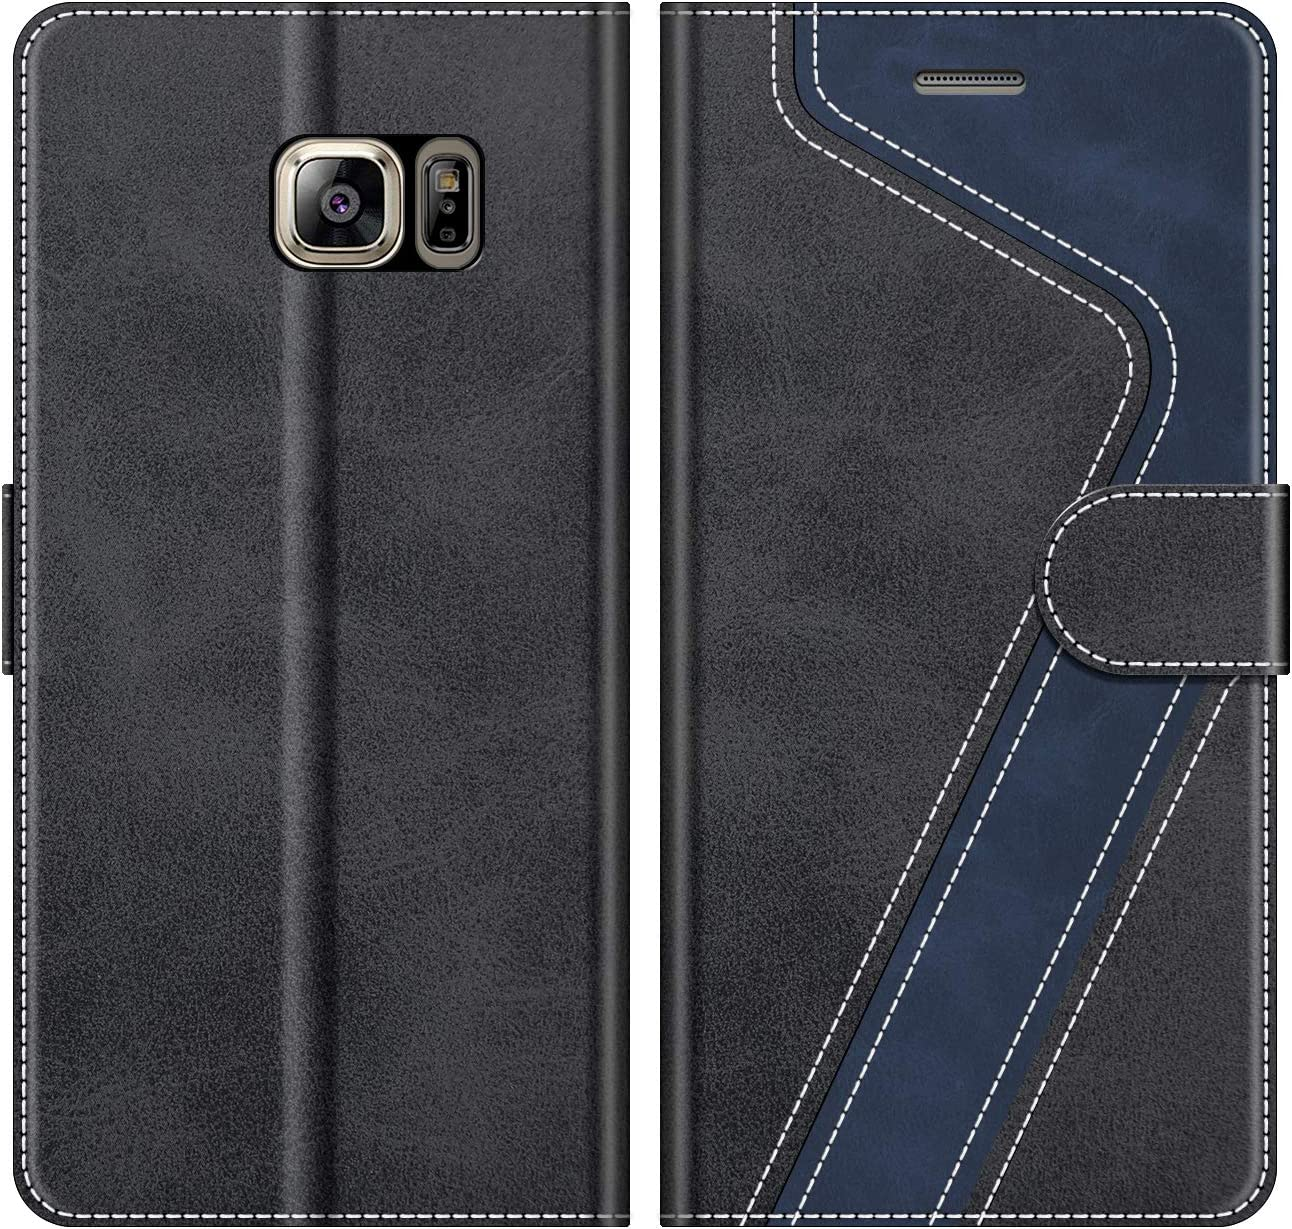 MOBESV Funda para Samsung Galaxy S6 Edge Plus, Funda Libro Samsung S6 Edge Plus, Funda Móvil Galaxy S6 Edge+ Magnético Carcasa para Samsung Galaxy S6 Edge Plus Funda con Tapa, Negro